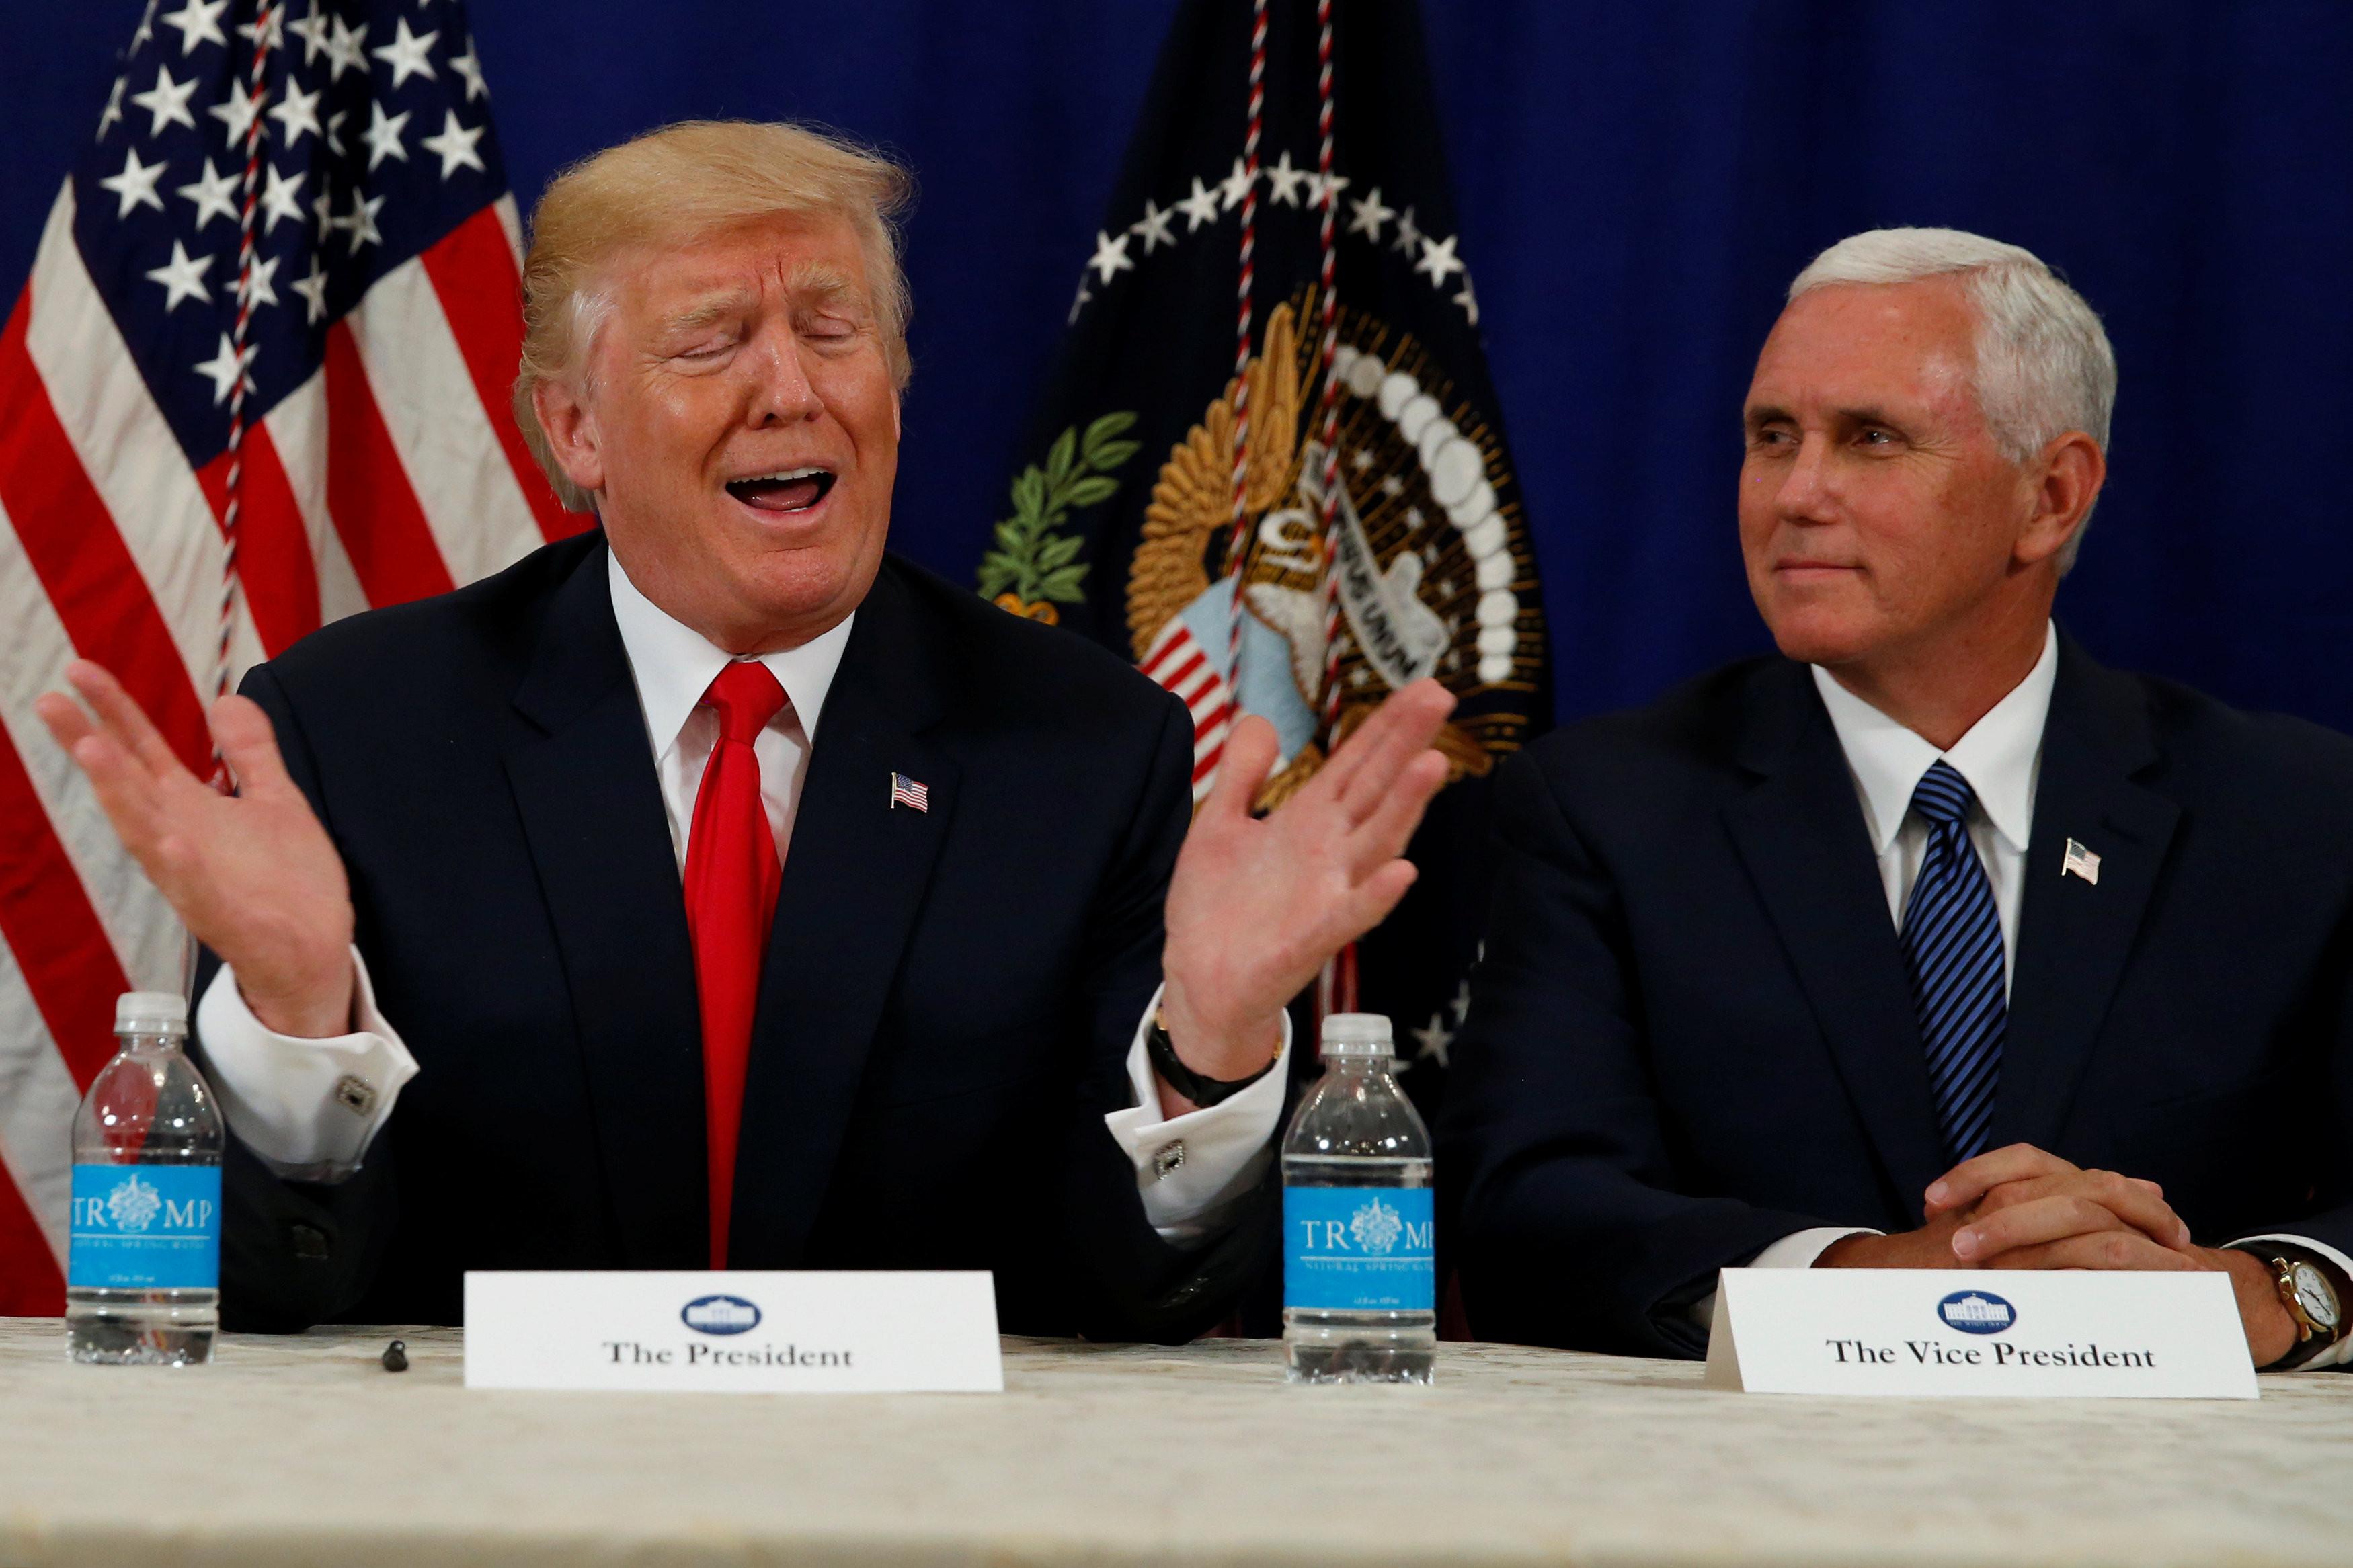 "<p>Президент США Дональд Трамп и вице-президент Майкл Пенс. Фото: &copy; REUTERS/Jonathan Ernst</p> <div data-qa-component=""item-detail""> <div></div> </div>"